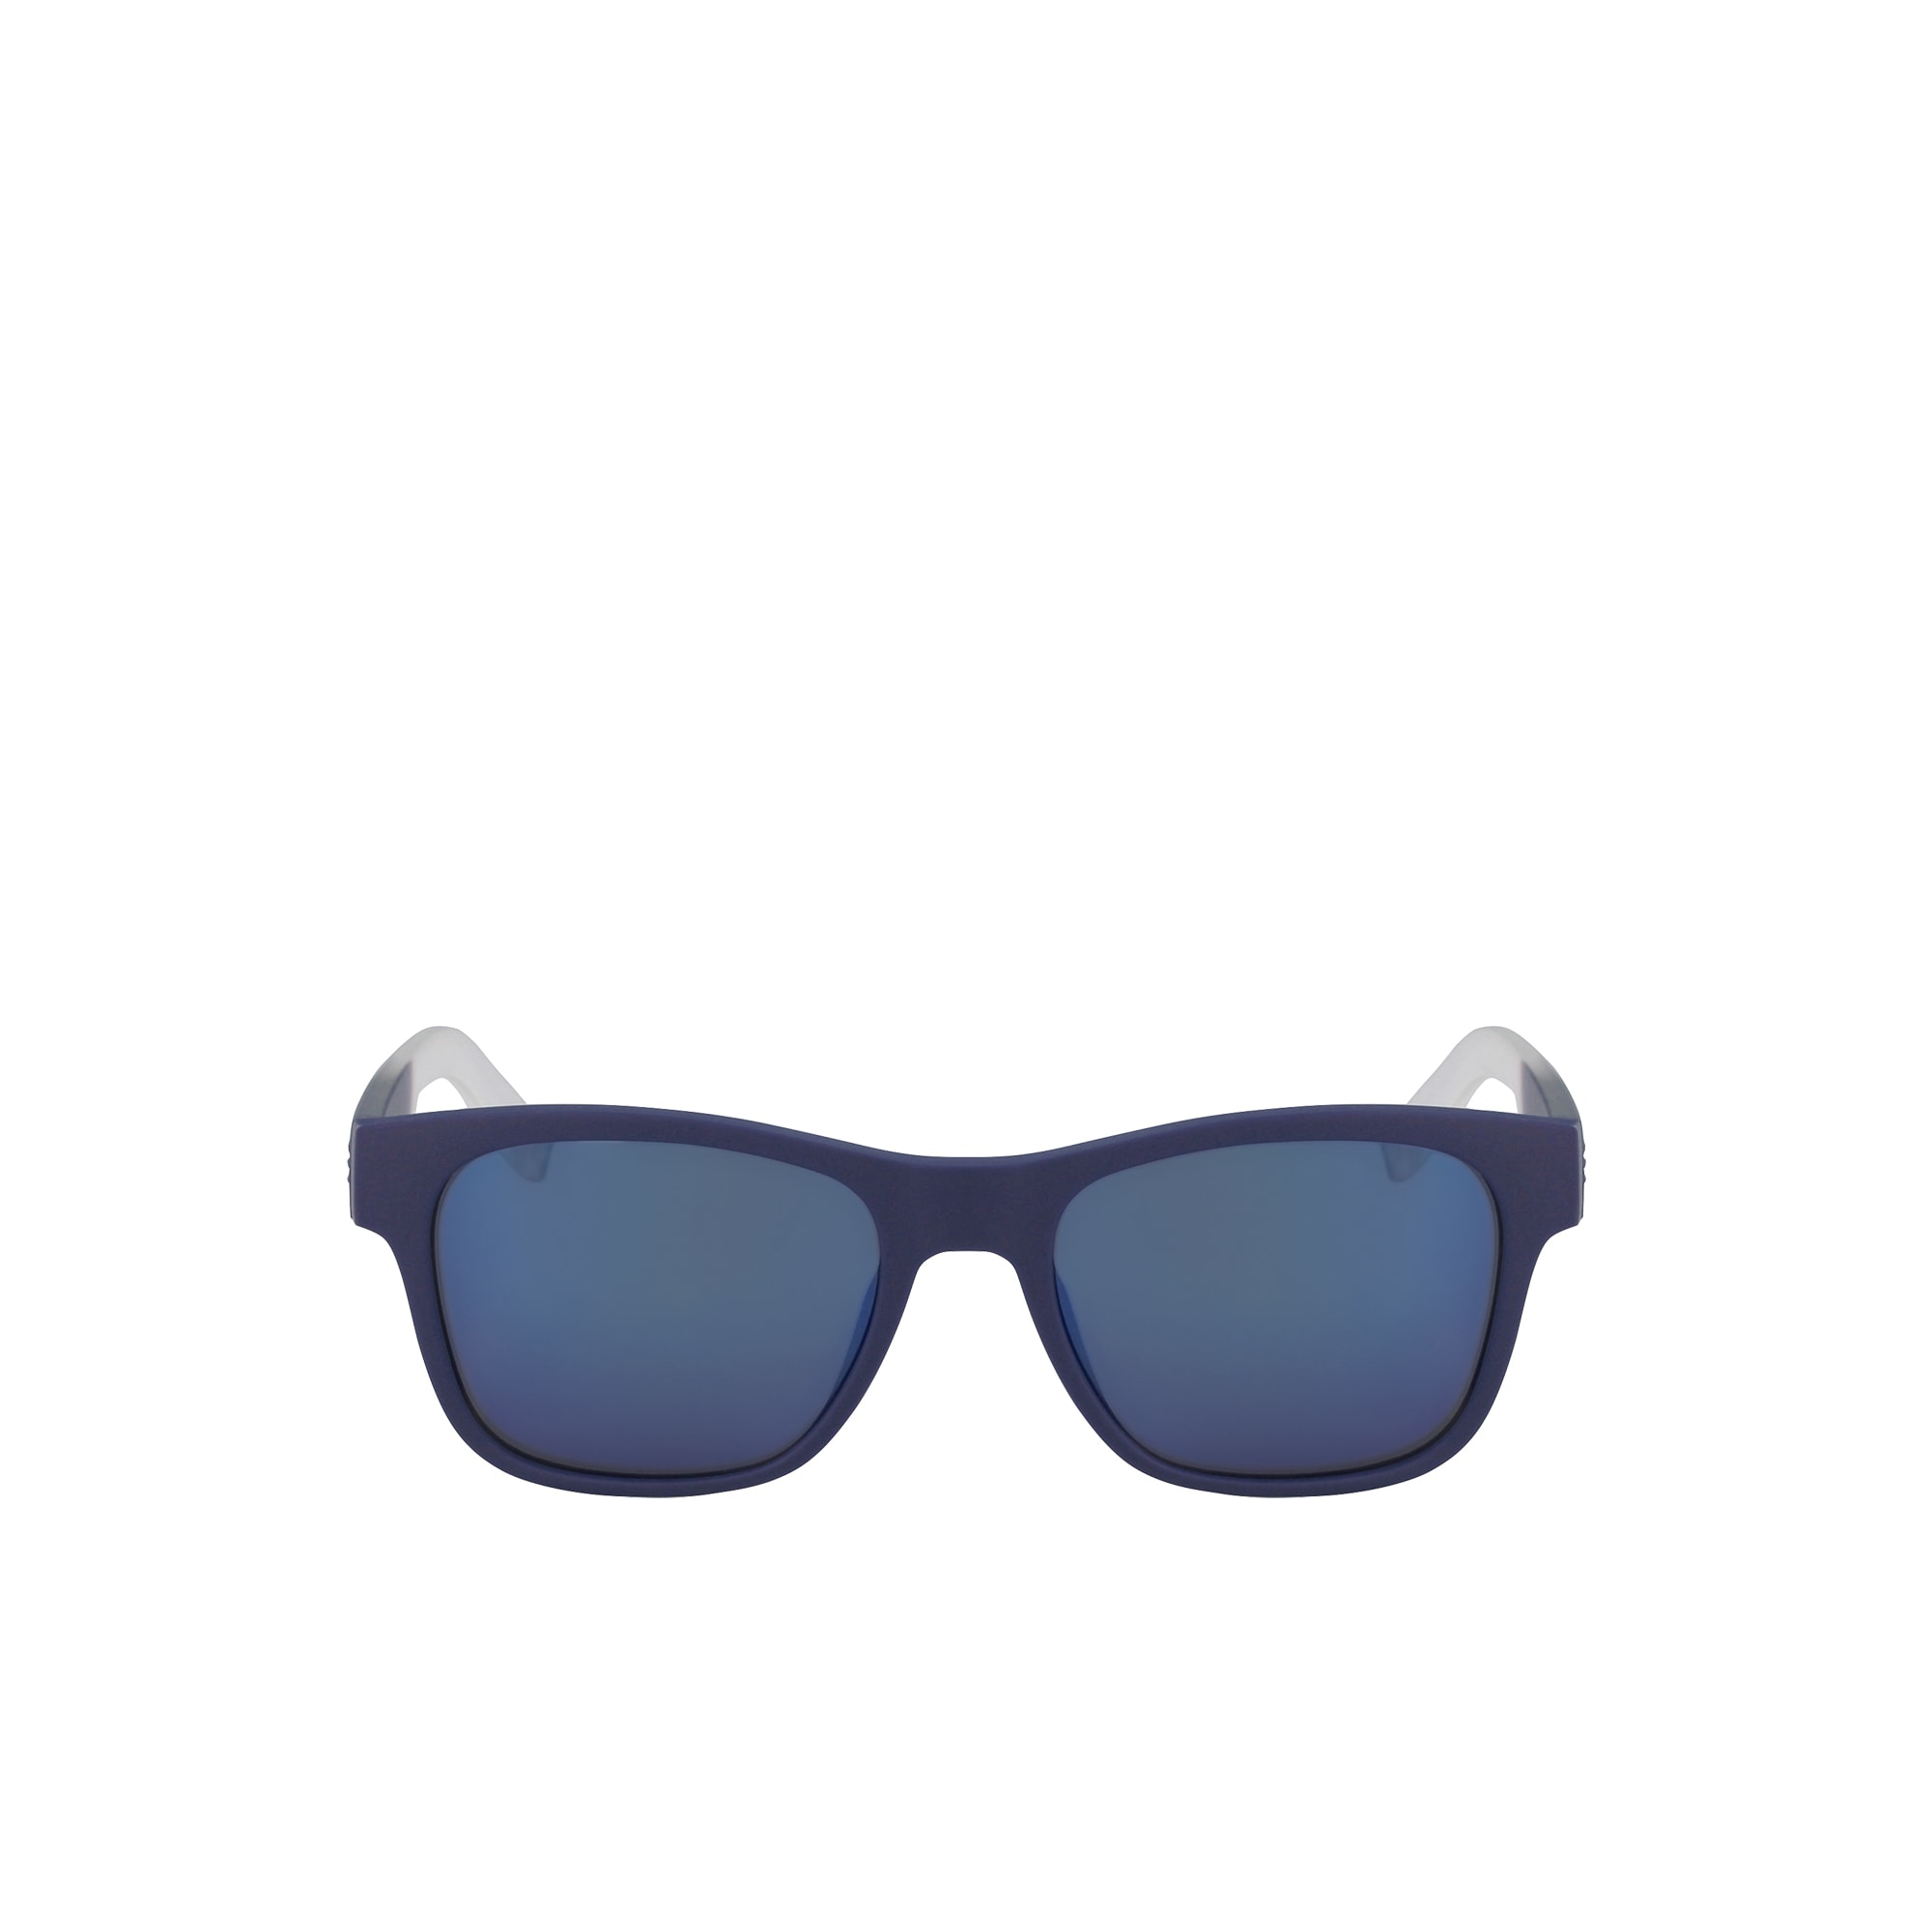 Occhiali da sole montatura plastica Novak Djokovic